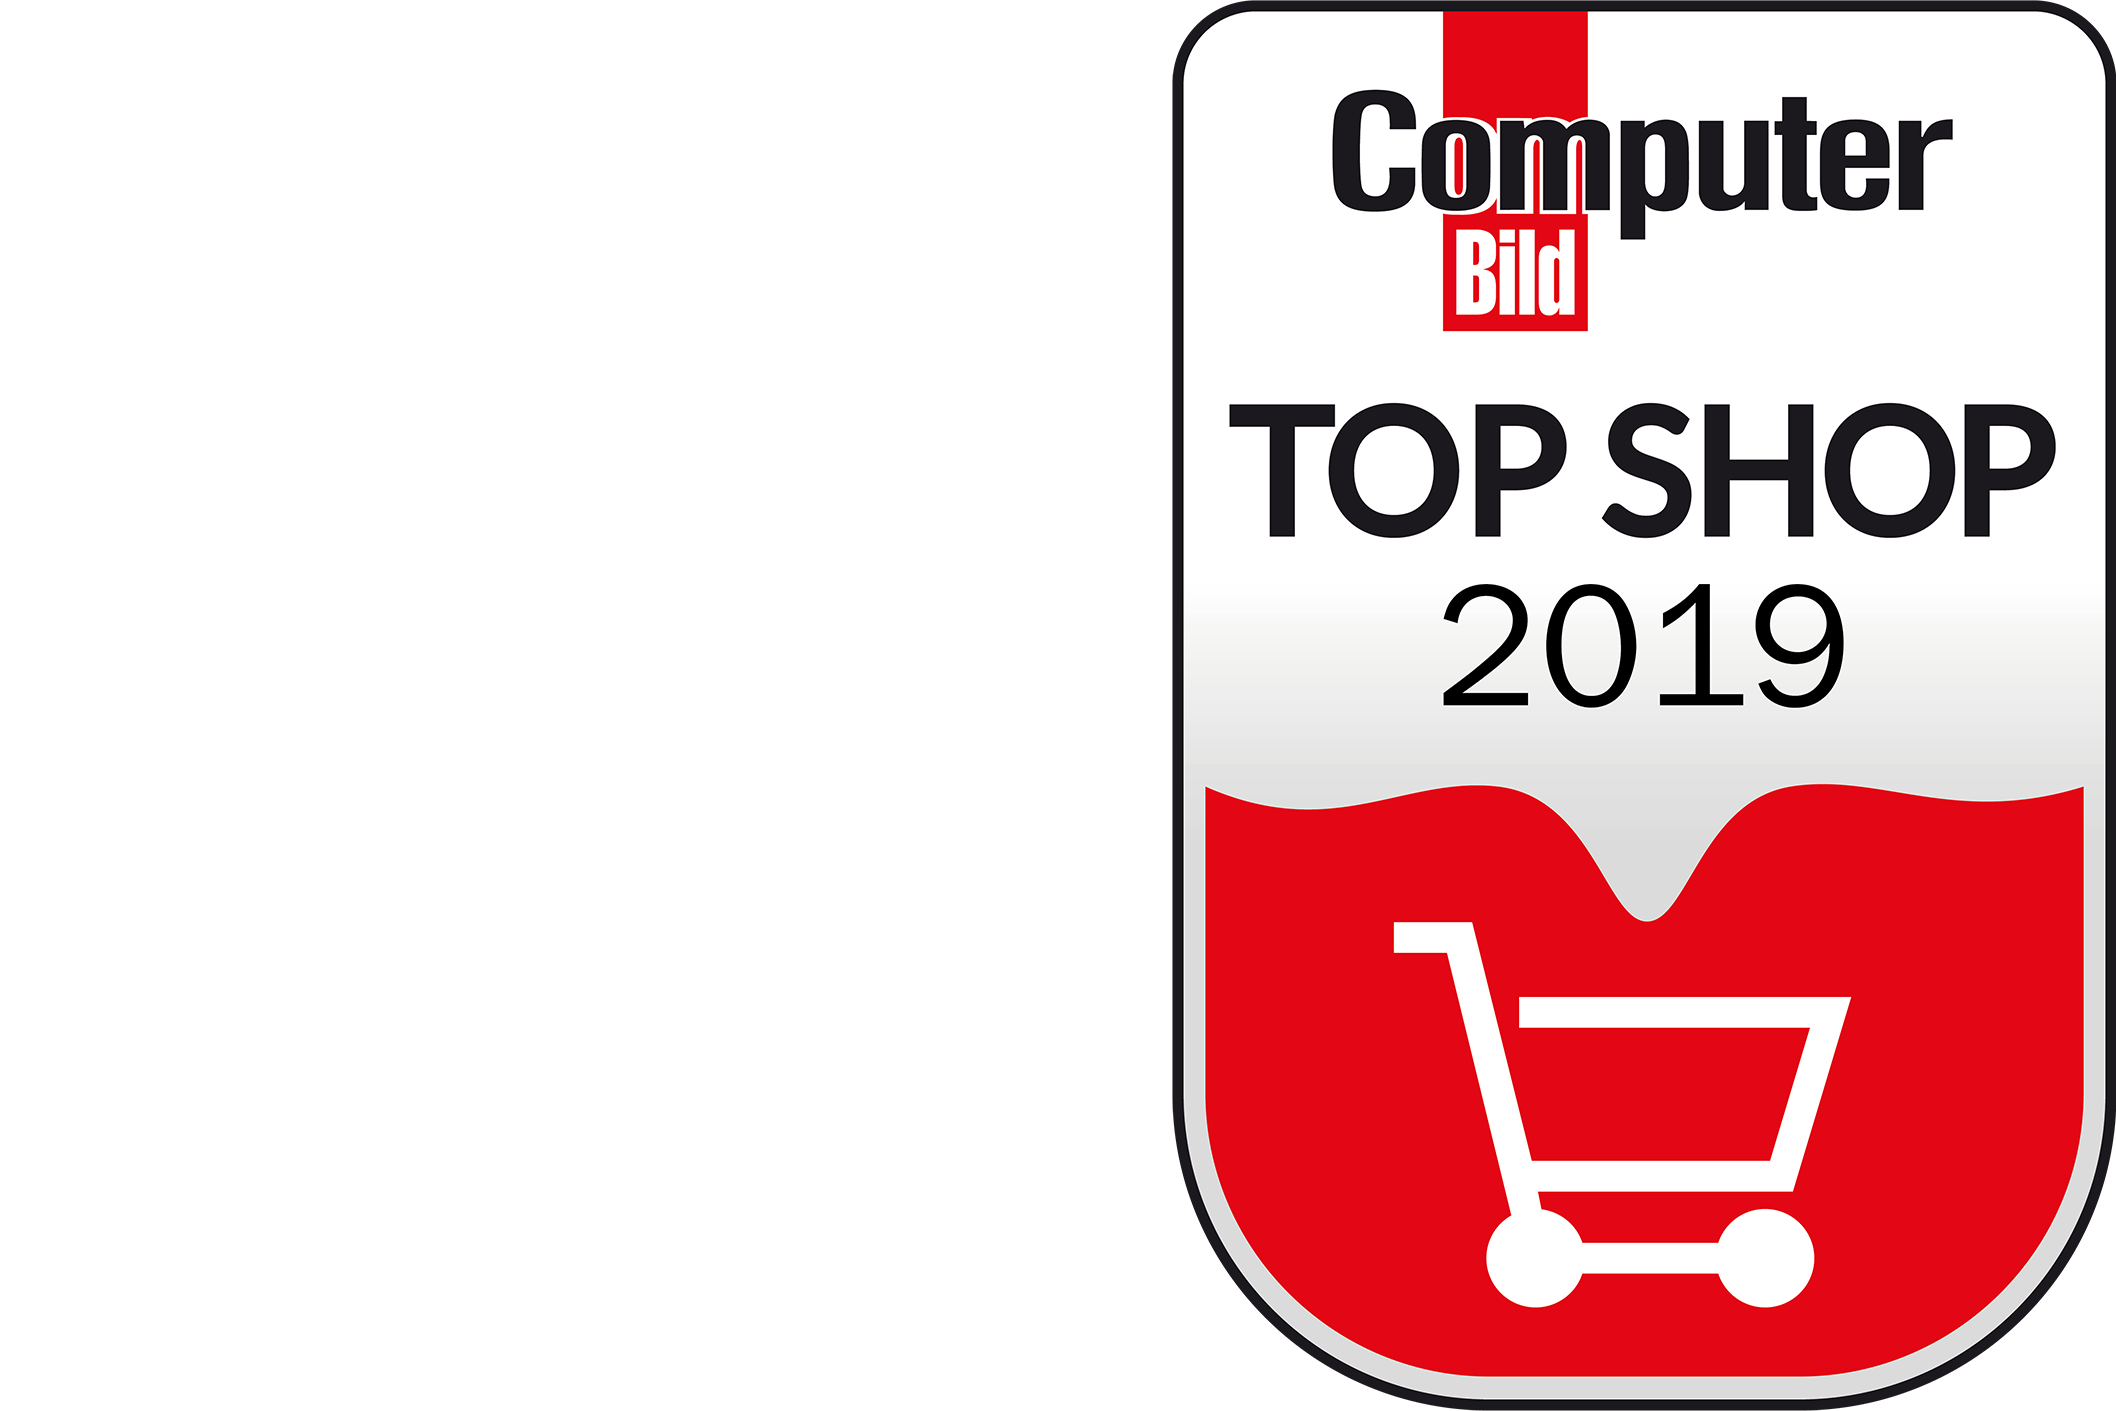 Computer Bild Tpo Shop 2019